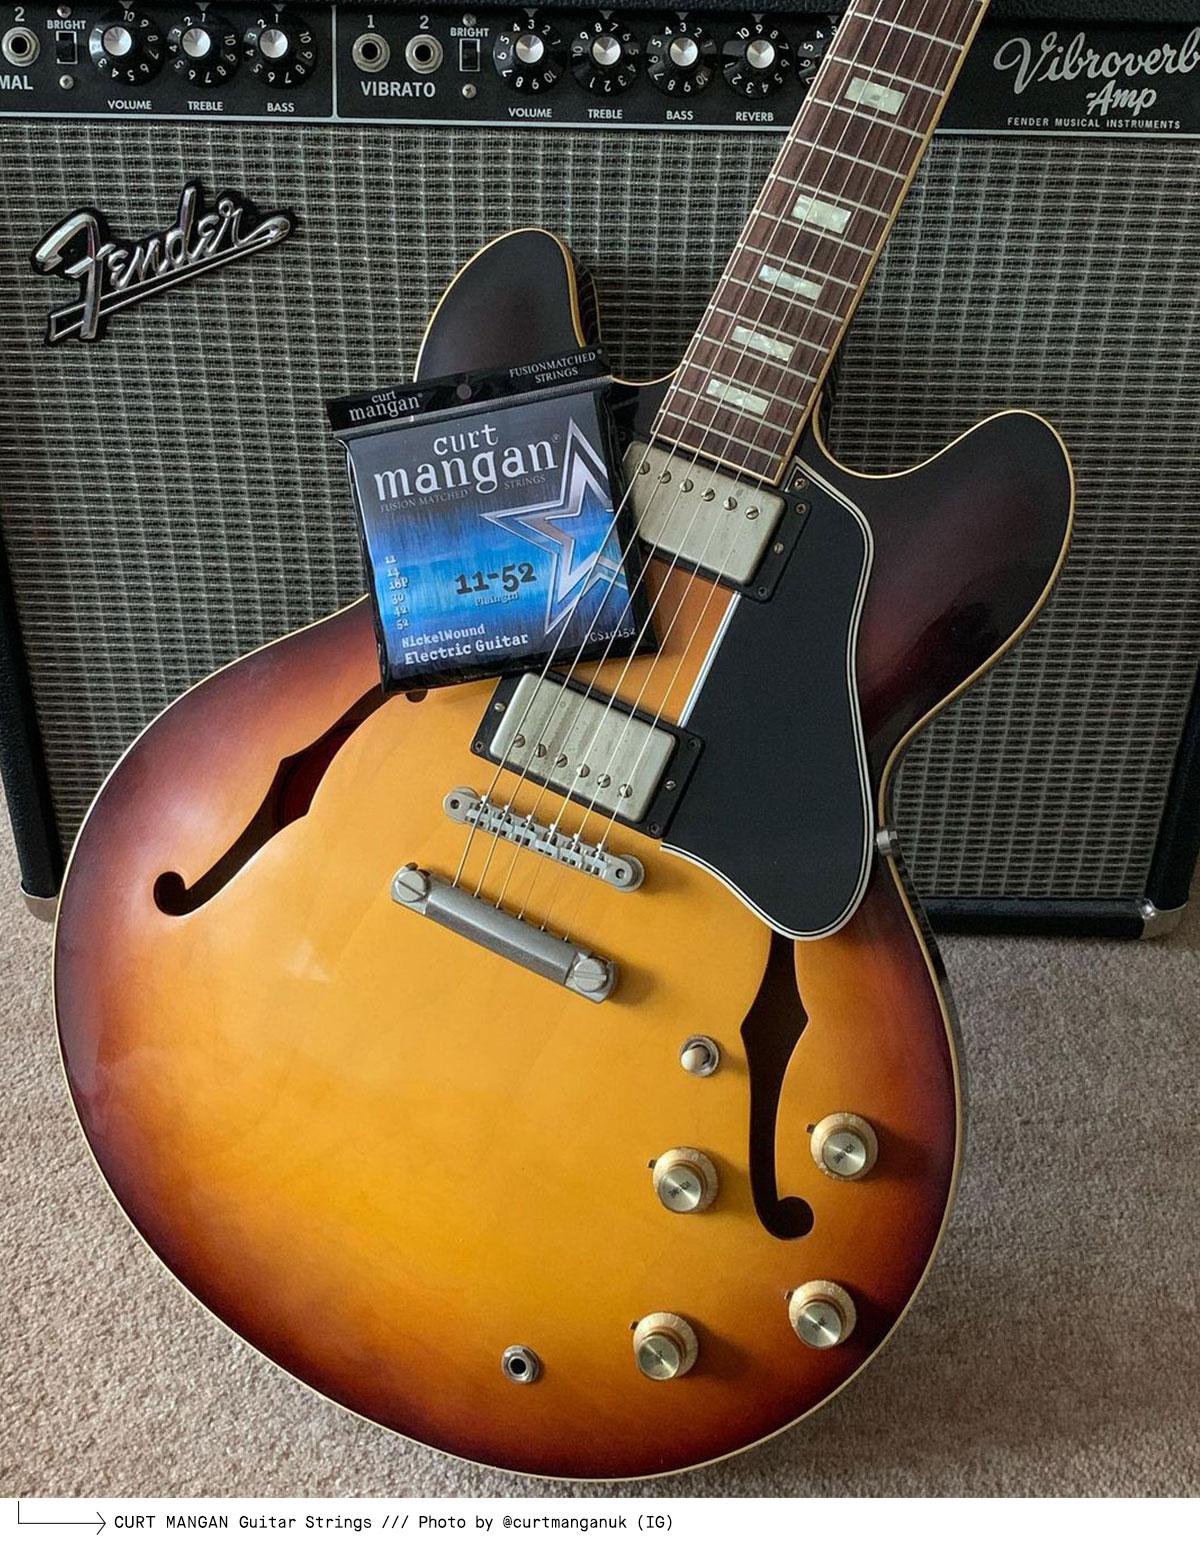 Curt Mangan Guitar Strings - Fret12 Journal